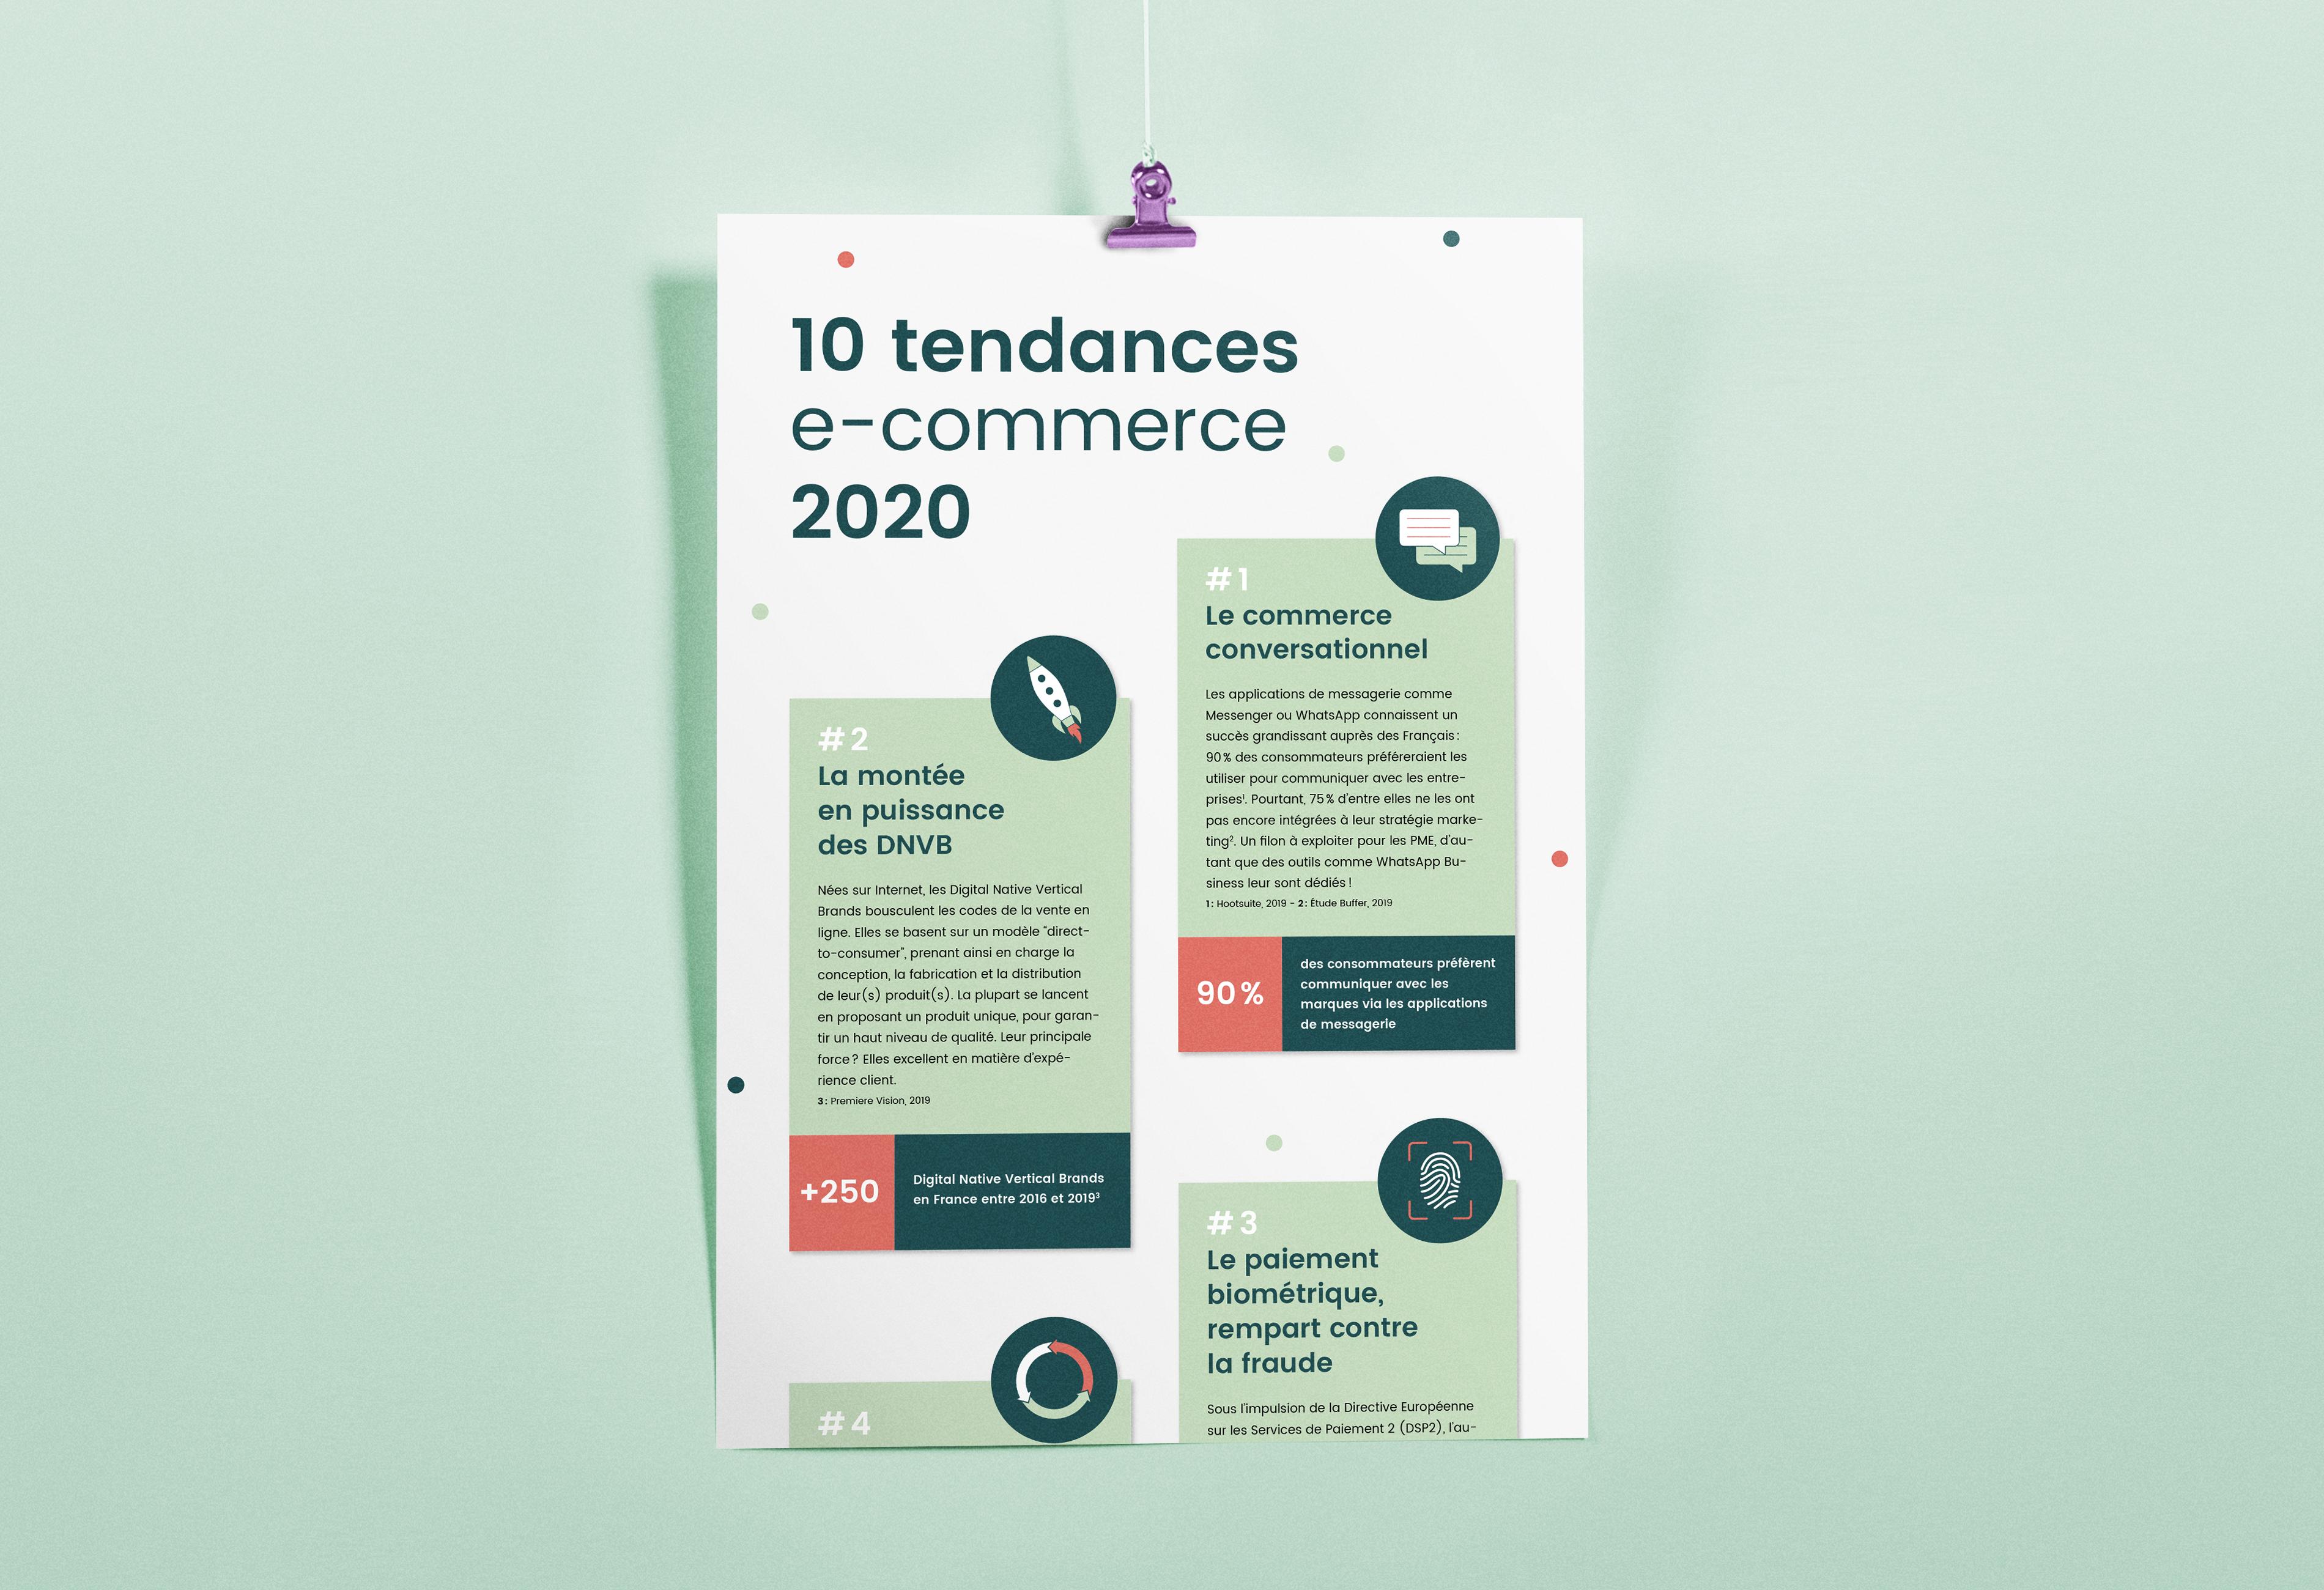 FR_MockUP2_Infographie_10 tendances e-commerce 2020